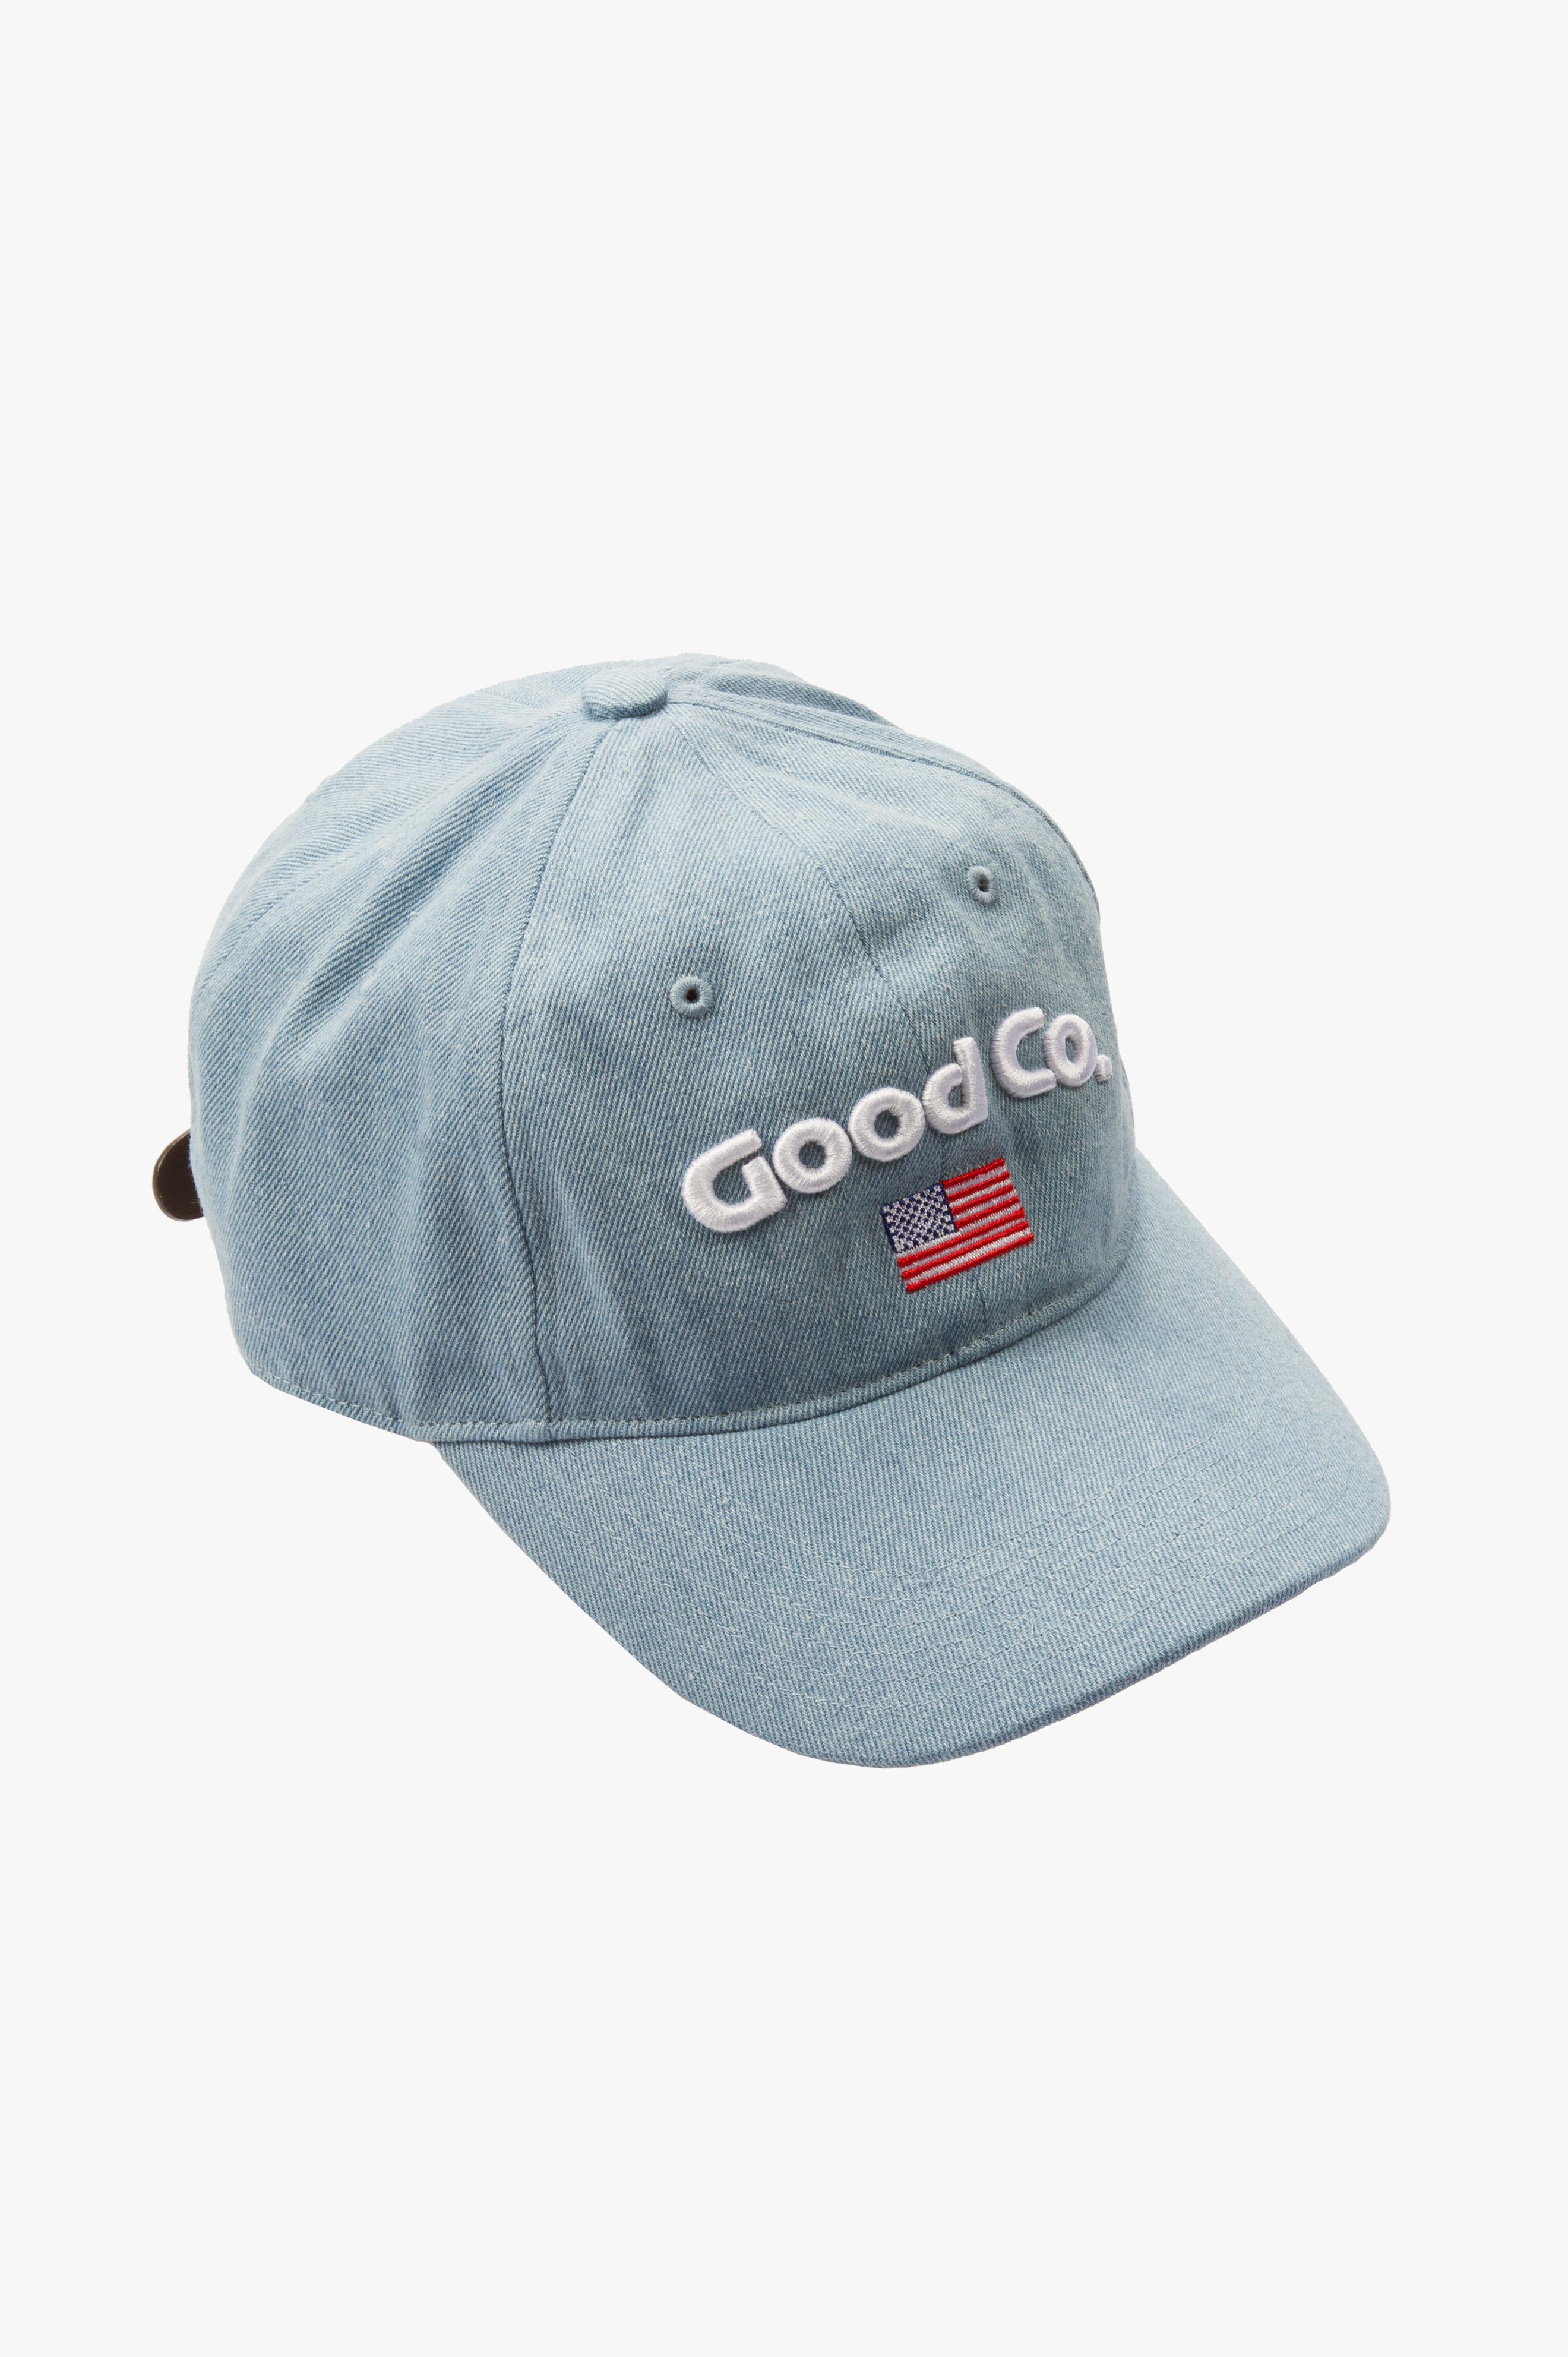 x THE GOOD COMPANY Cap Blue